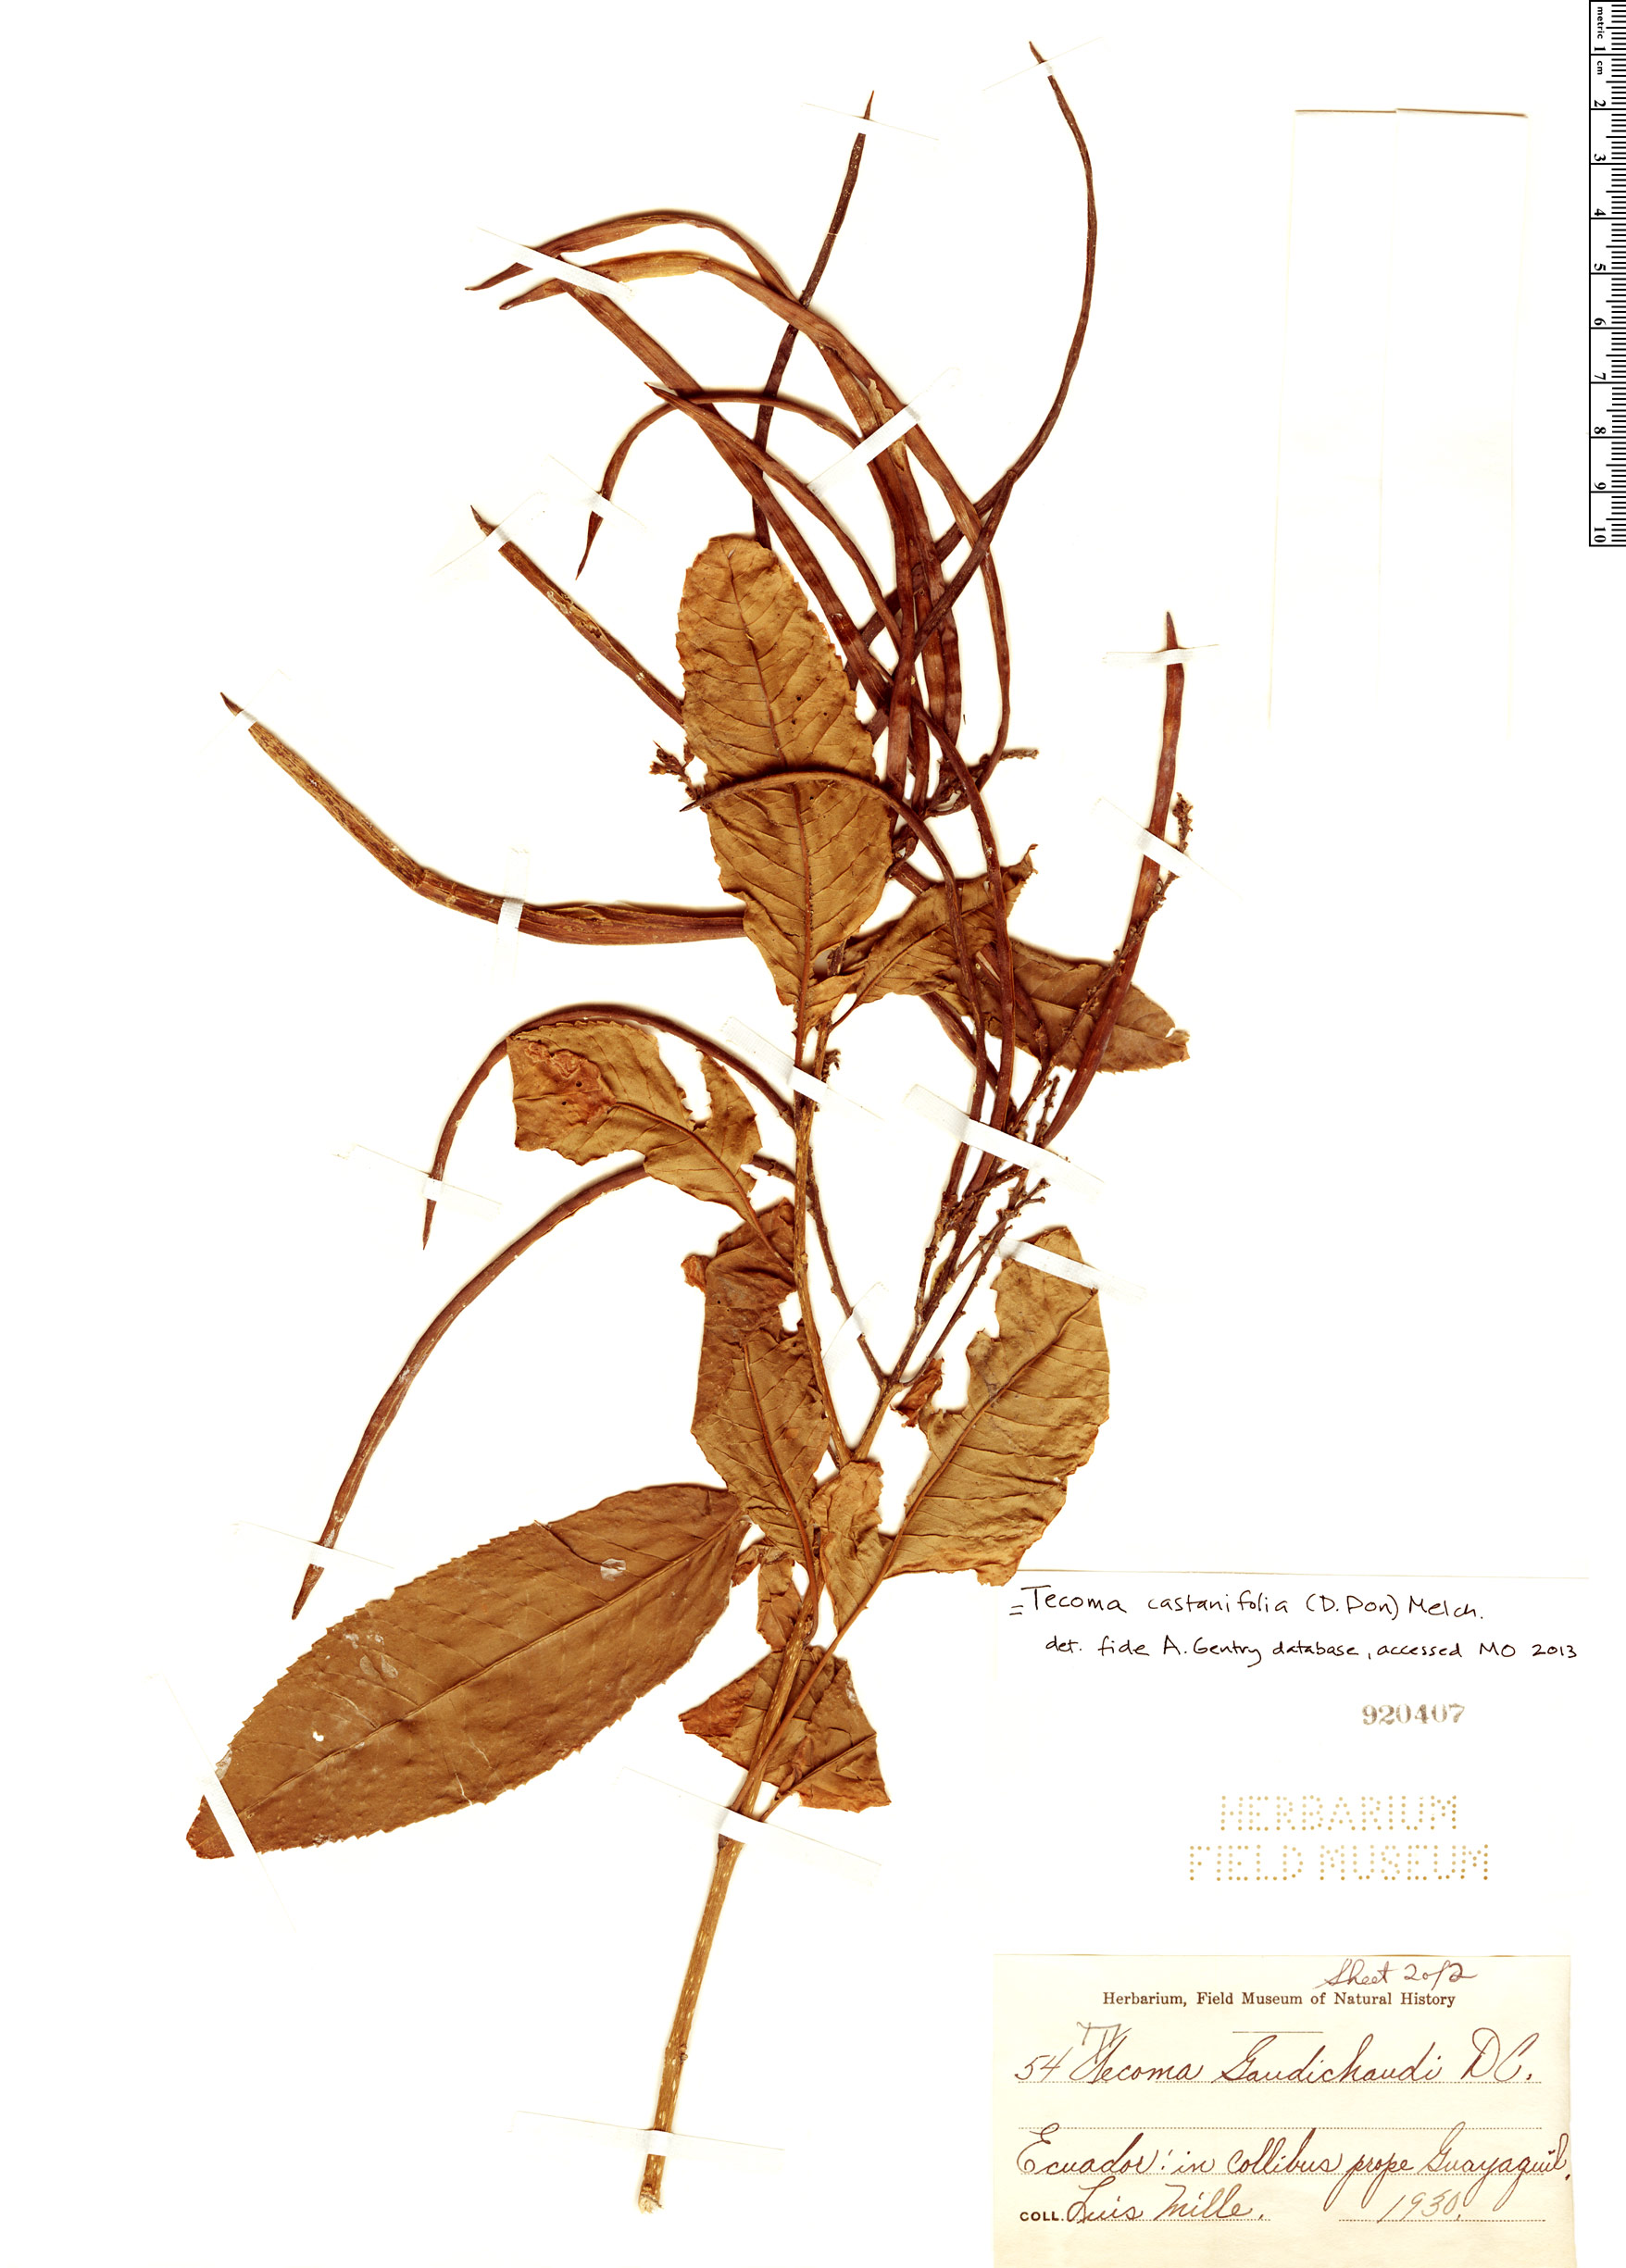 Specimen: Tecoma castanifolia